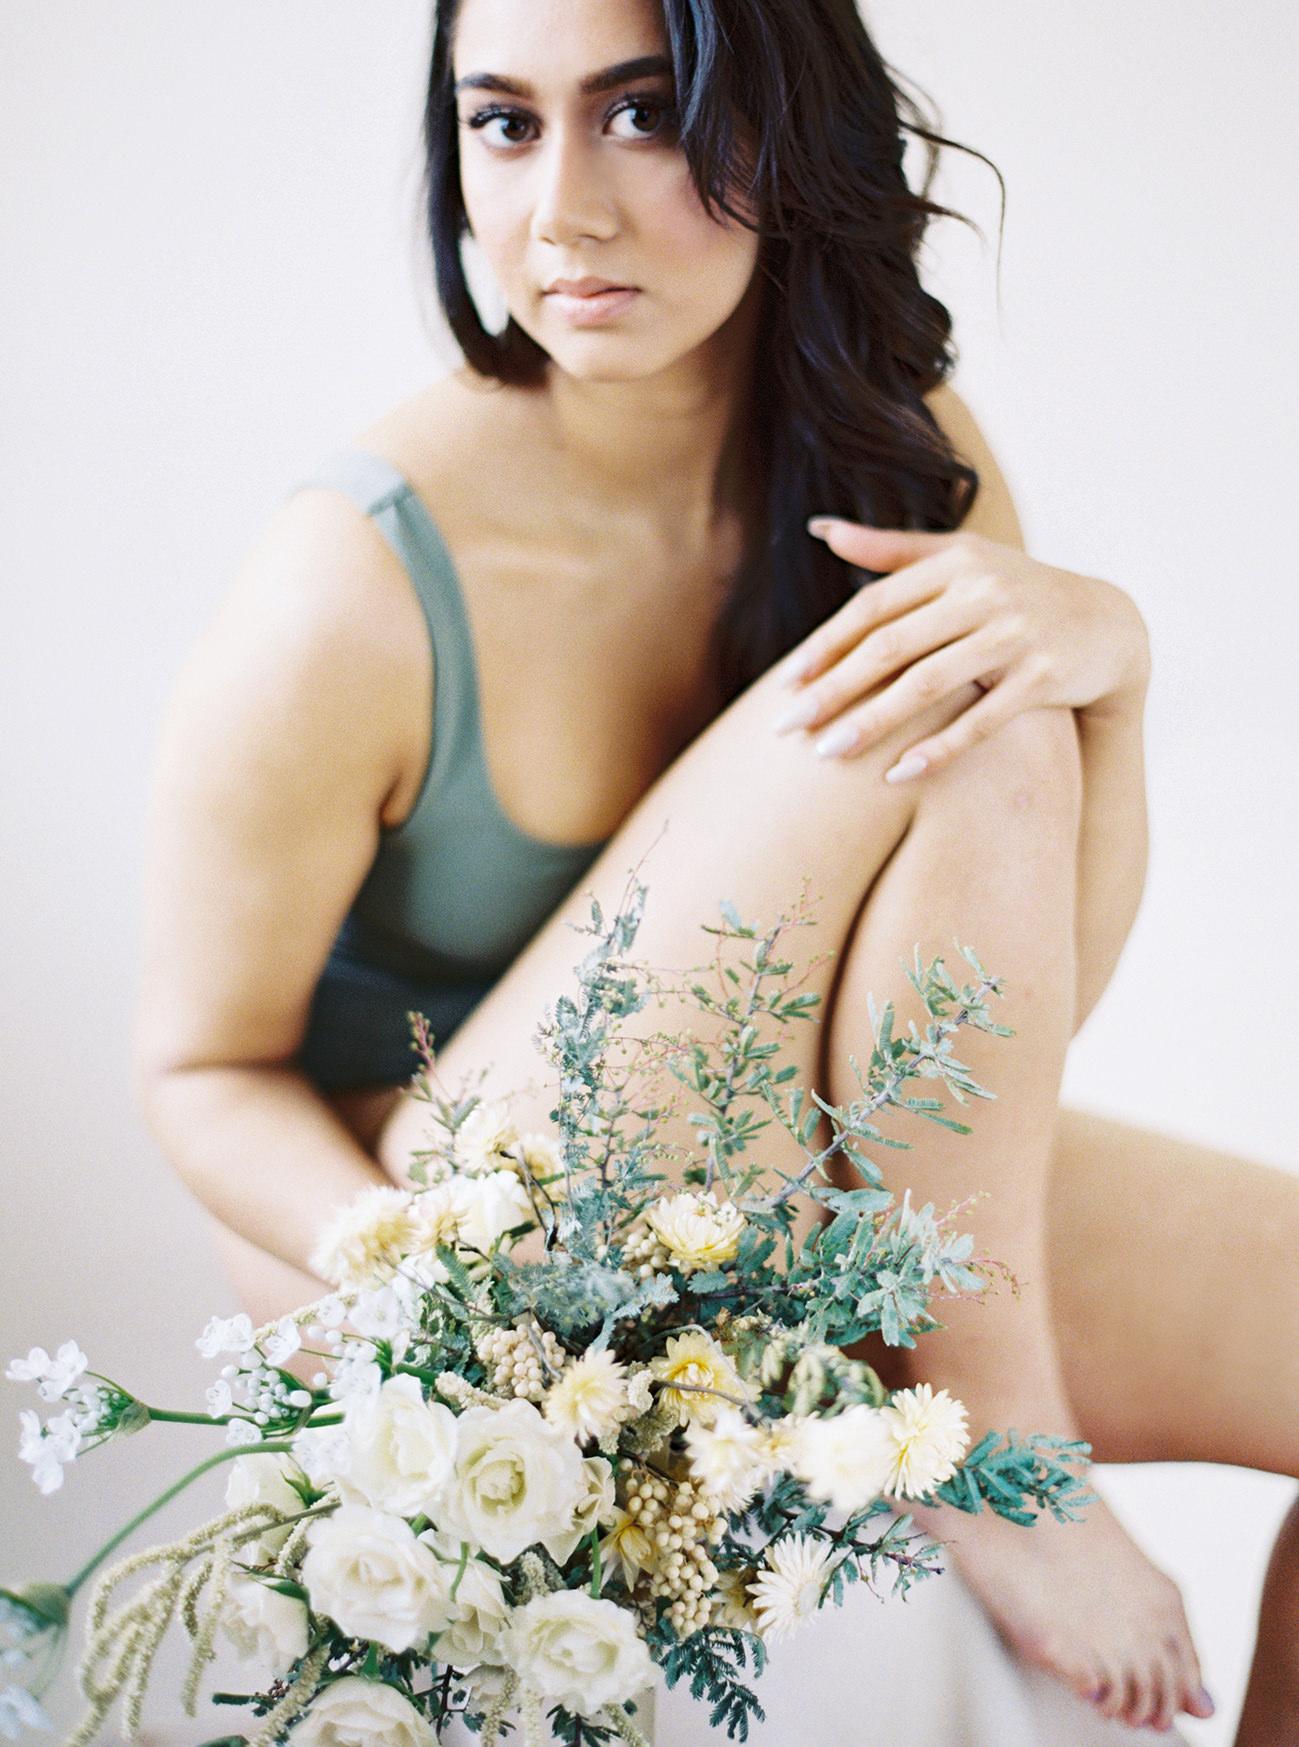 Bridal Inspiration, Wedding Bouquet, Hääkuvaus, Film Wedding Photographer, Table Setting Inspiration, Stationery, Dried Flowers, www.nordandmae.com, www.susannanordvall (3).jpg